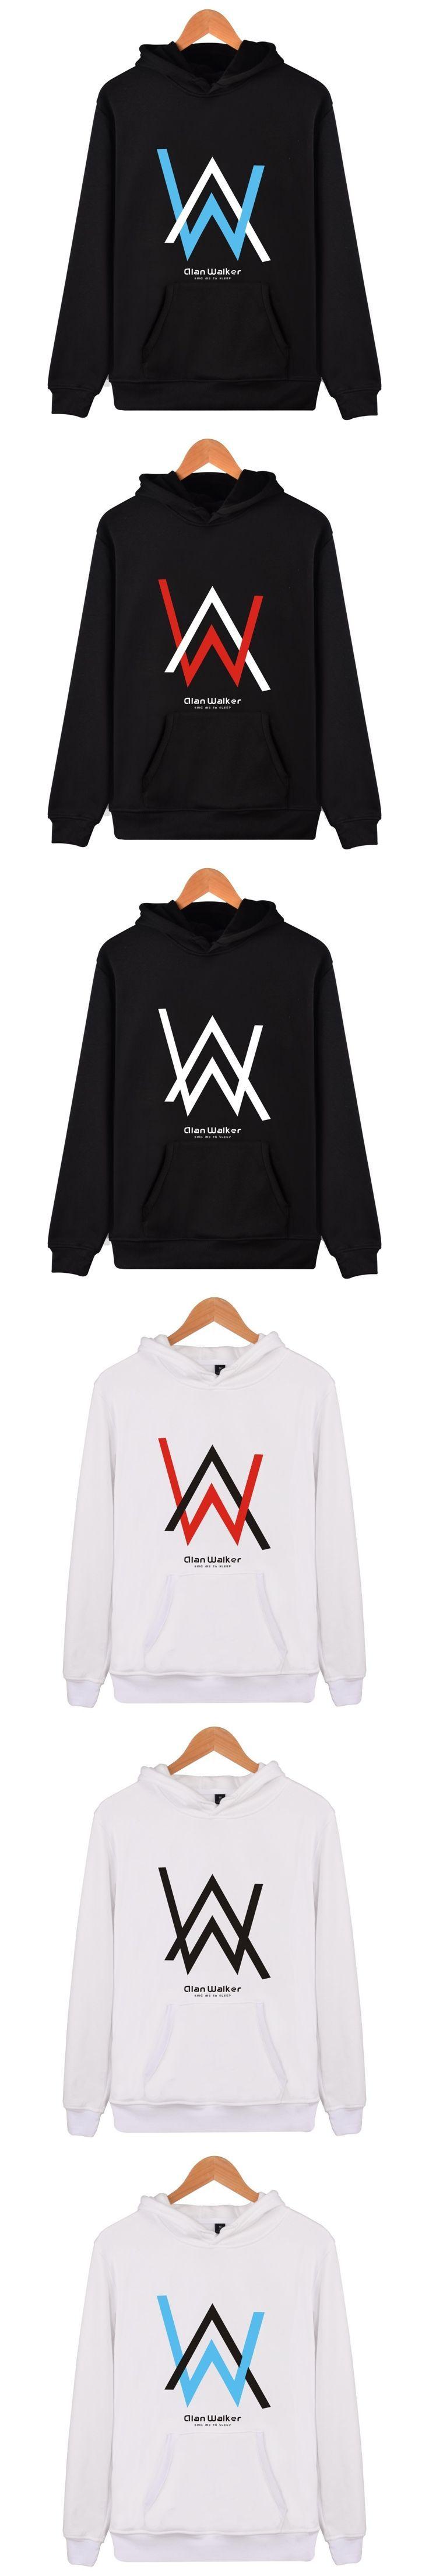 Alan Walker Electronic Music Hooded Hoodies Men Hip Hop Fashion Funny Sweatshirt Men Black Popular Singer High Quality Clothes